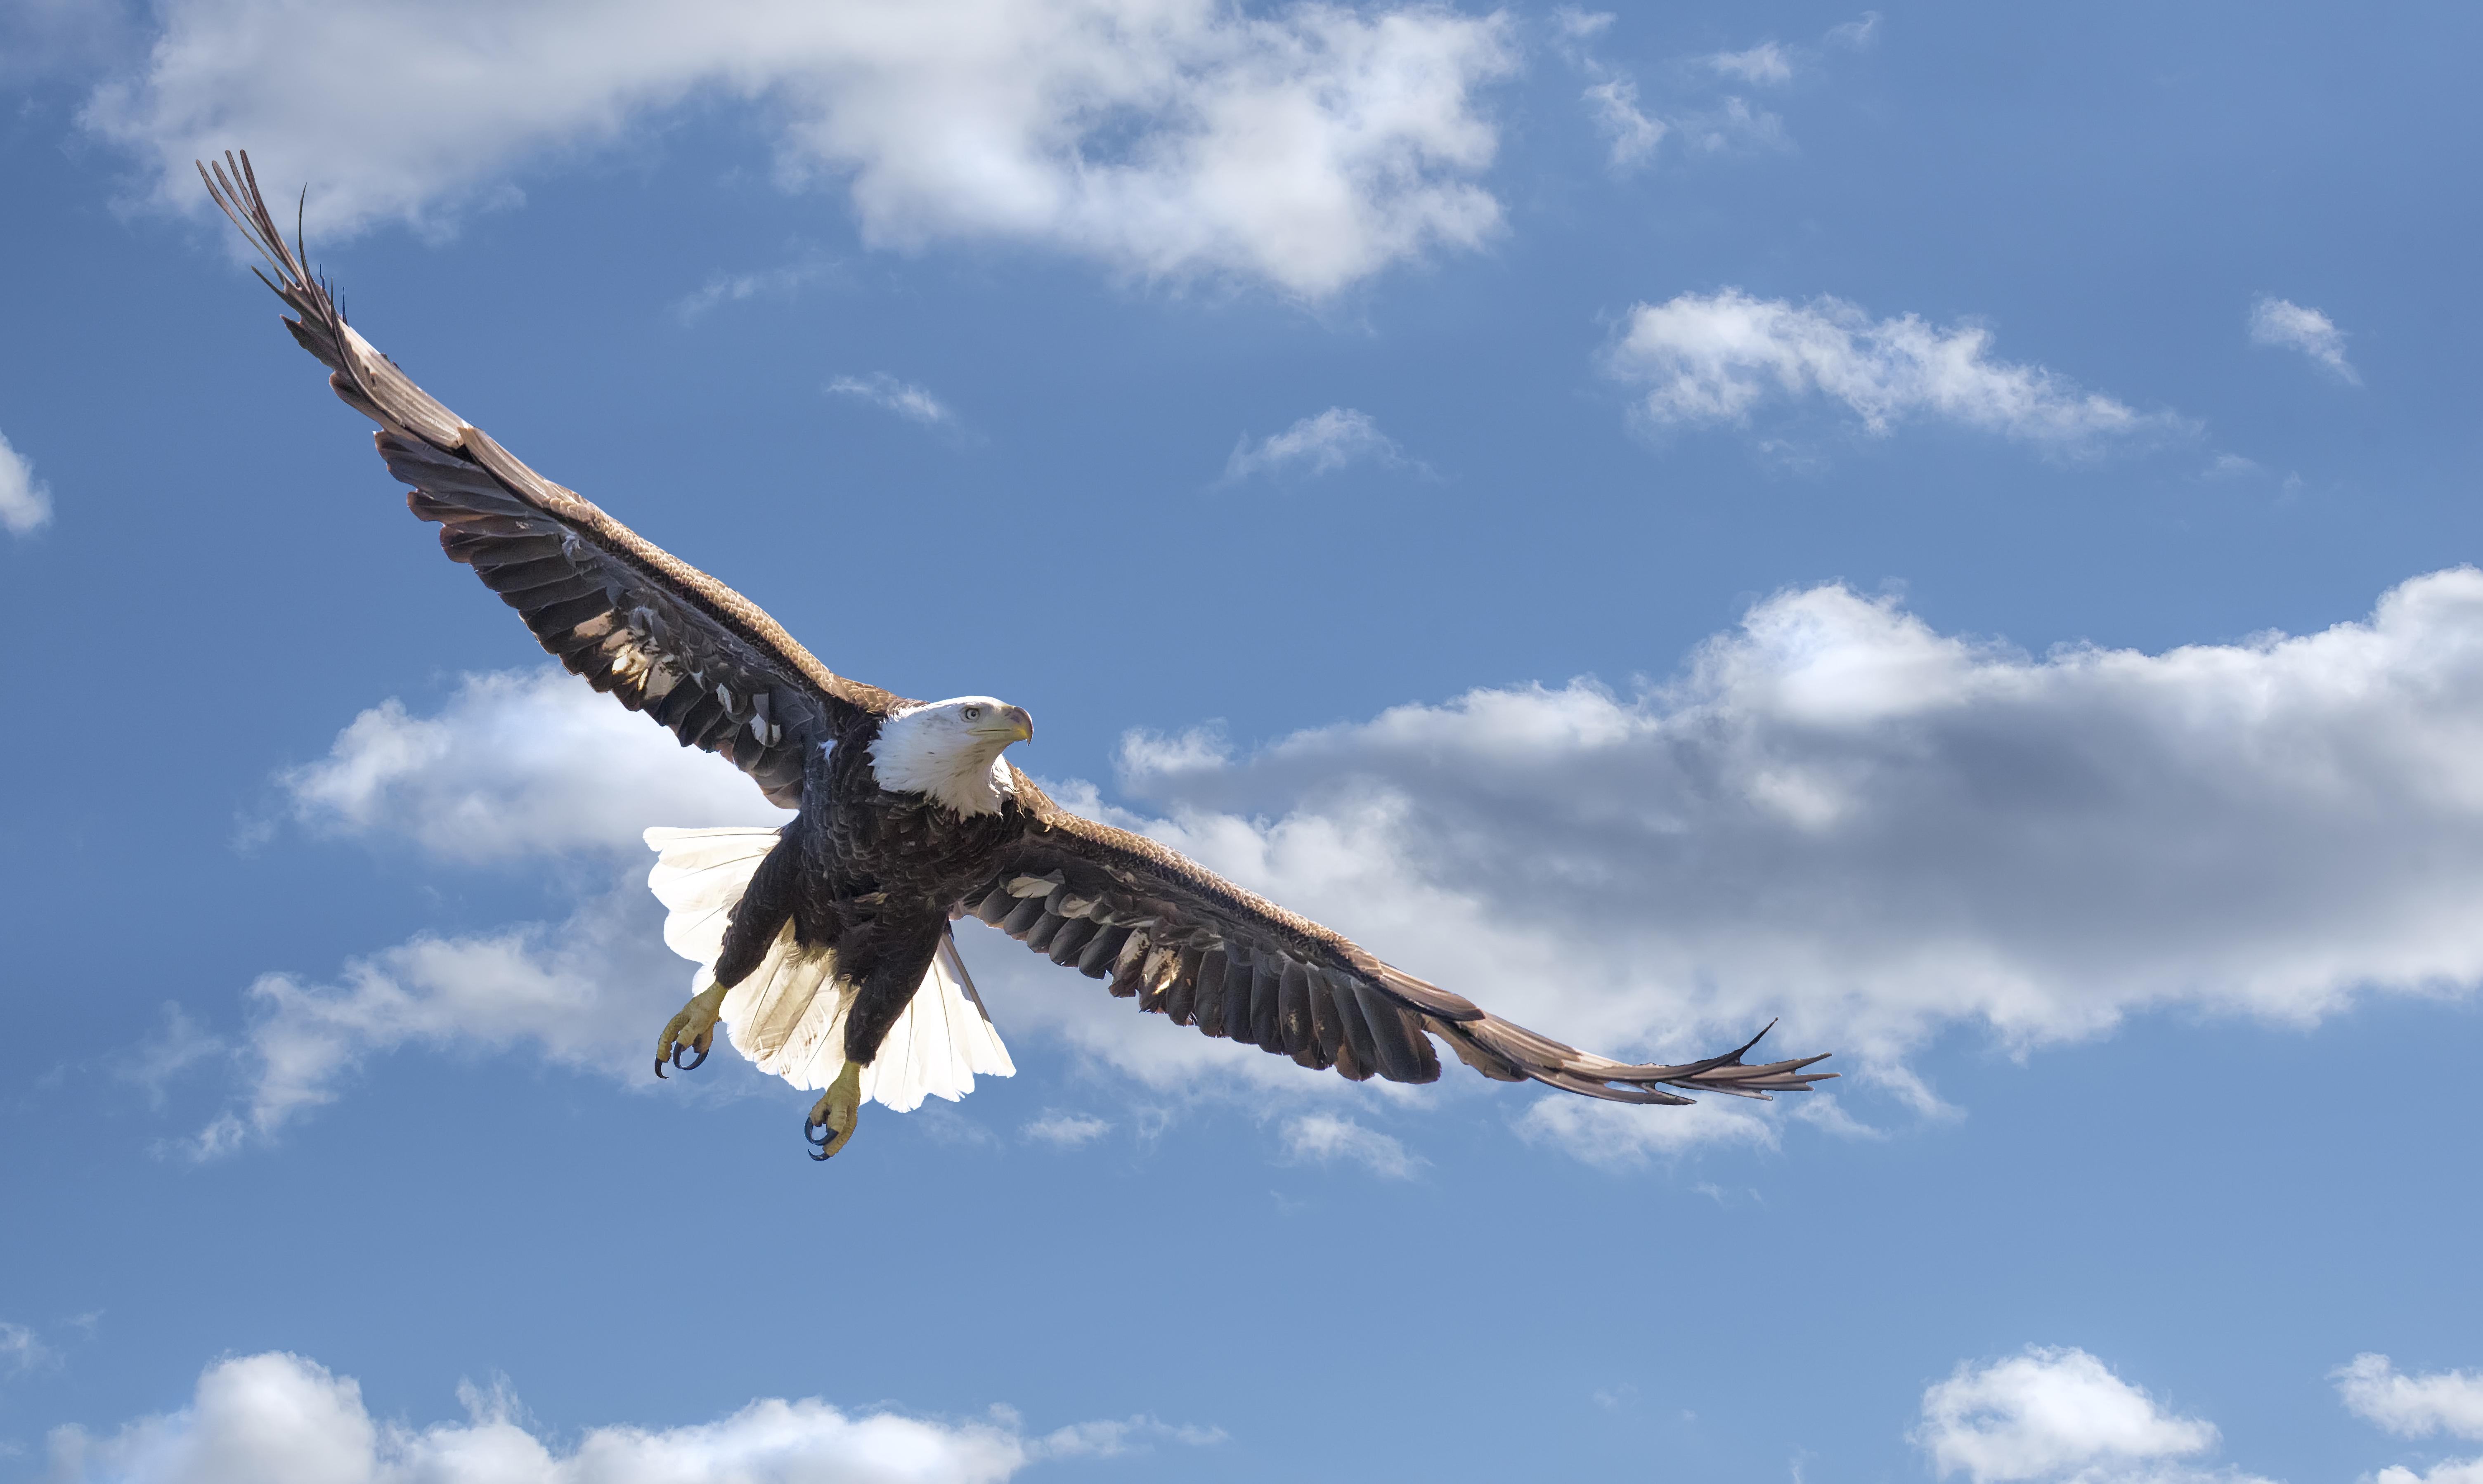 Eagle-in-clouds